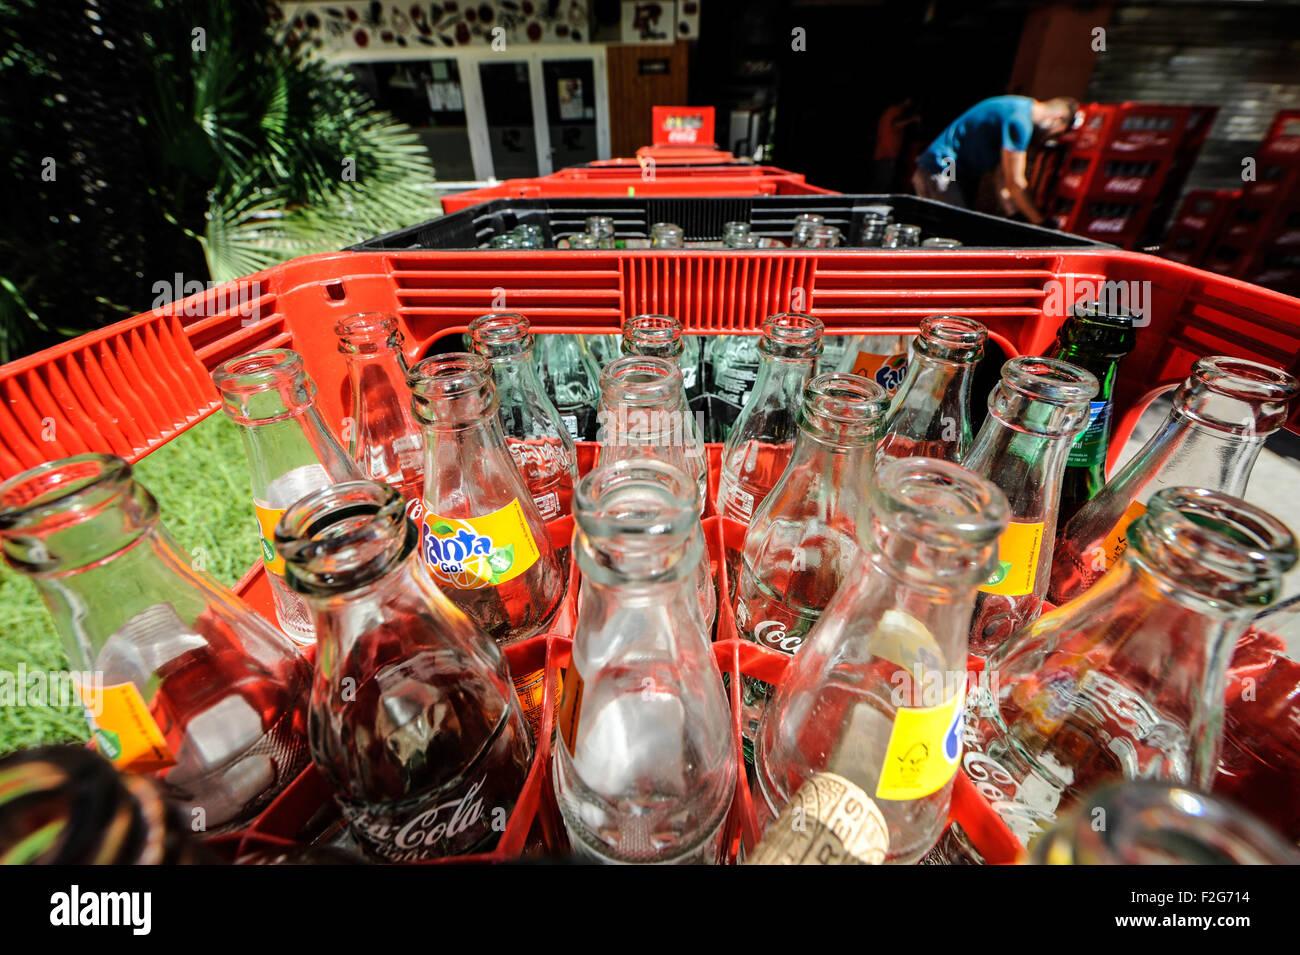 assortment of empty drink bottles - Stock Image